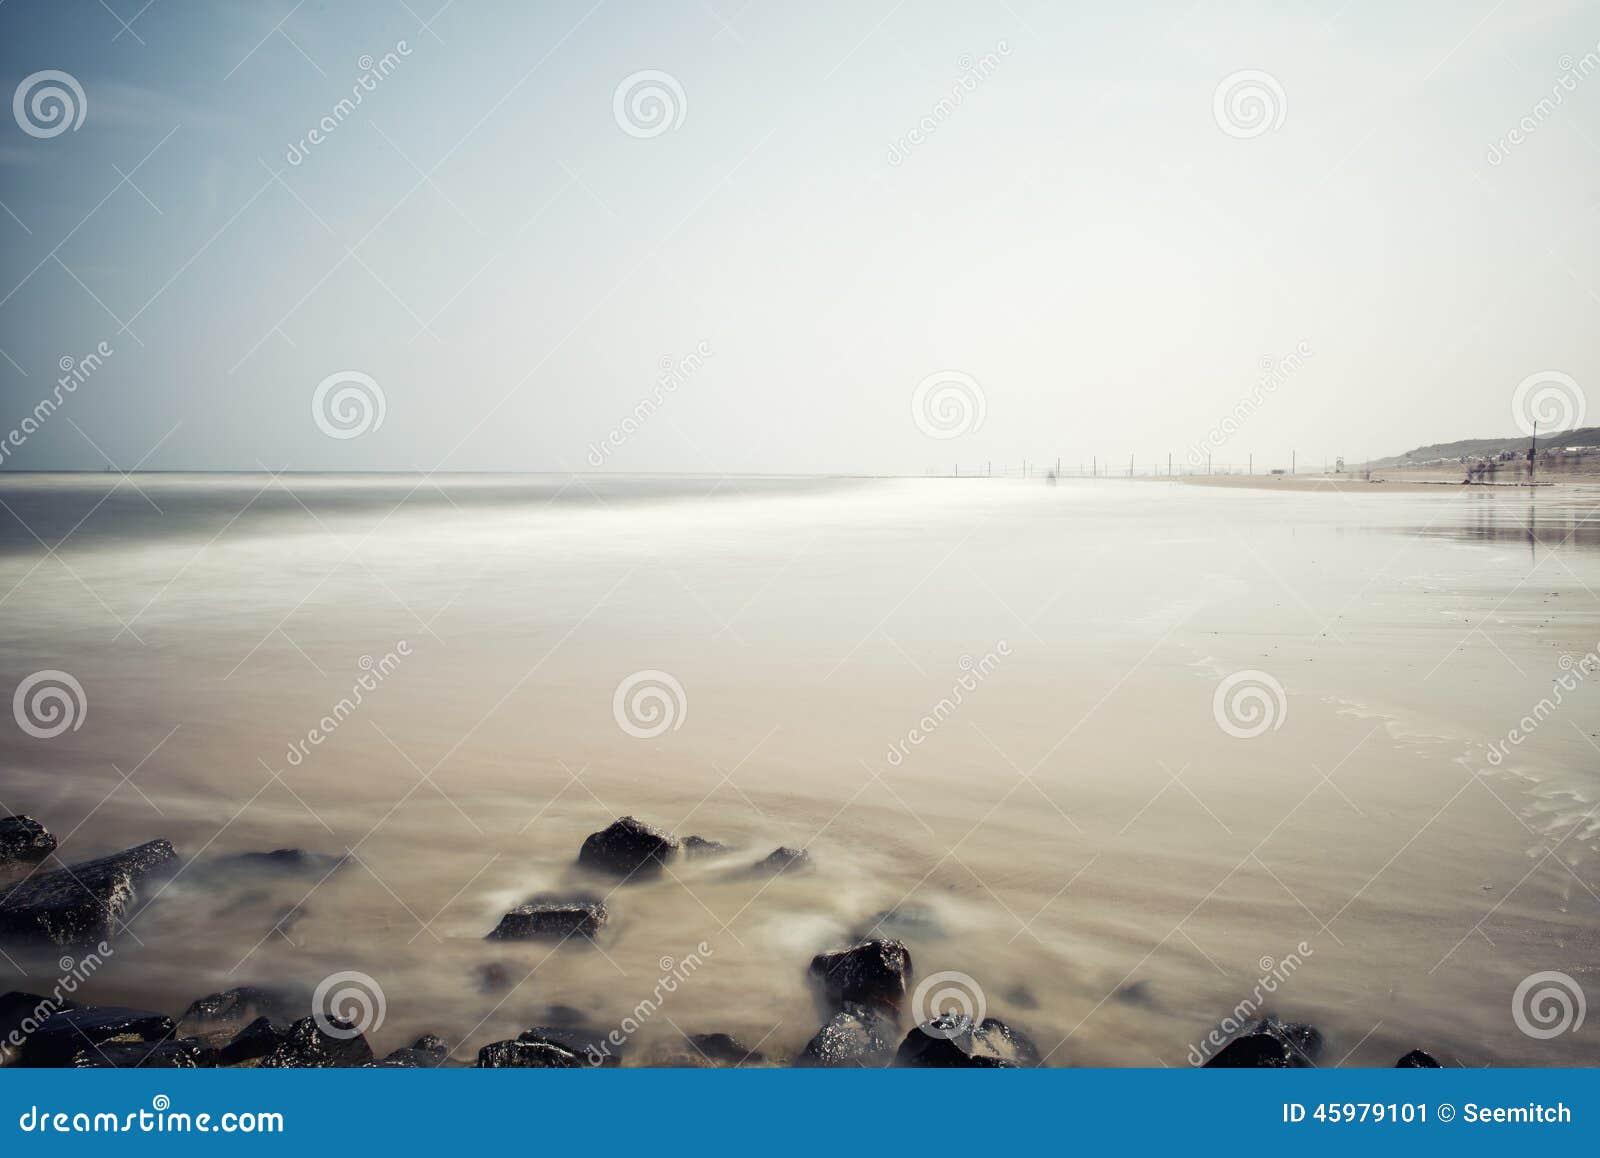 Paysage marin brumeux minimaliste avec des roches